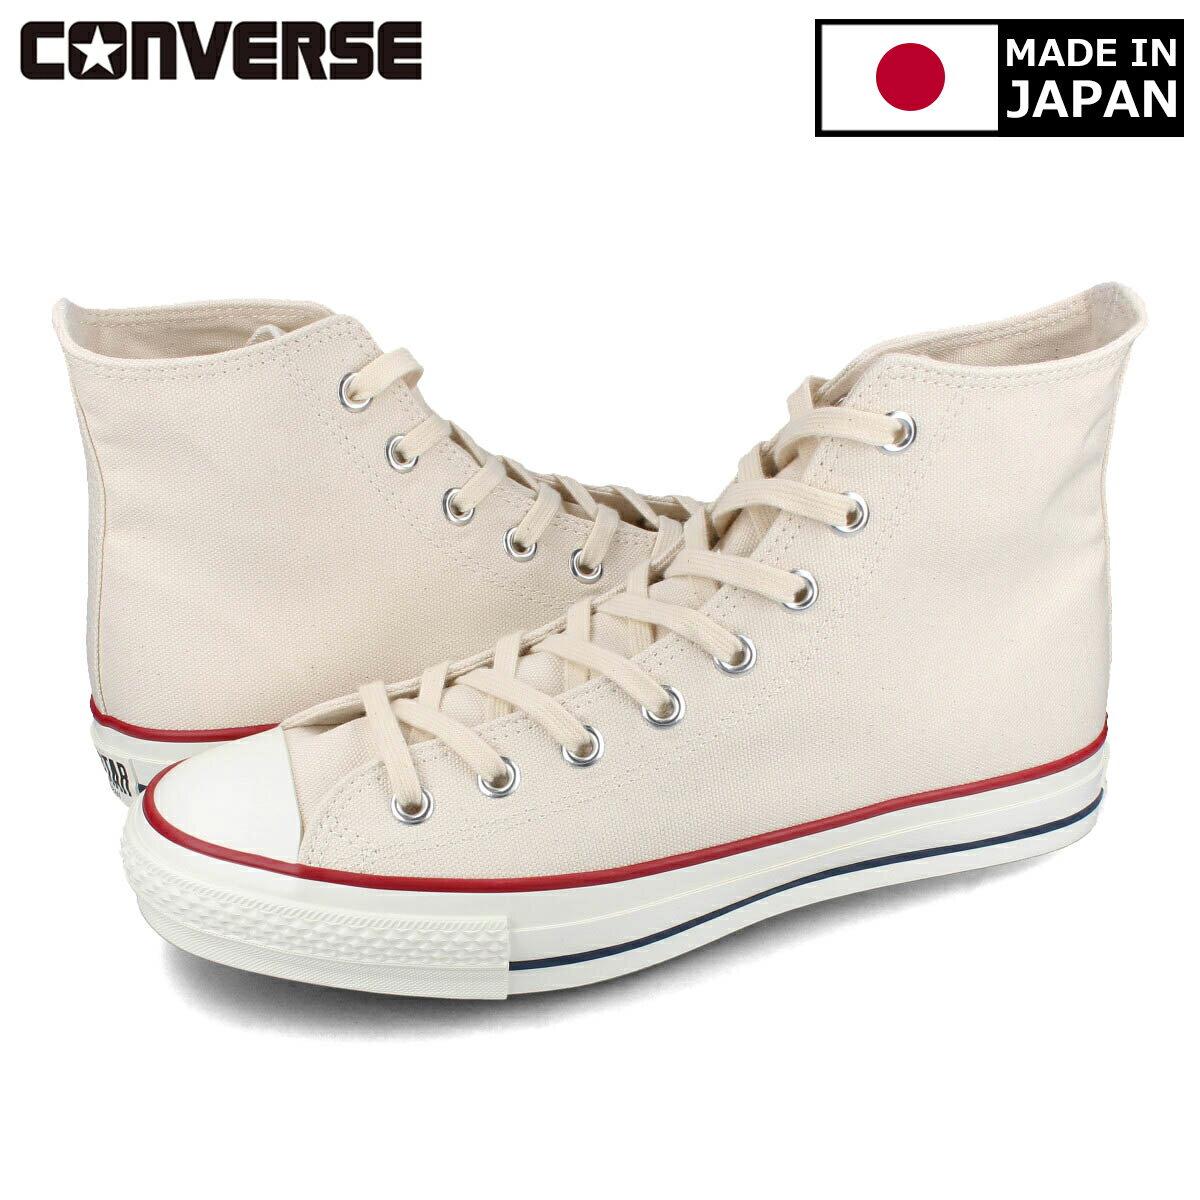 CONVERSE CANVAS ALL STAR J HI 【MADE IN JAPAN】【日本製】 コンバース オールスター J HI NATURAL WHITE